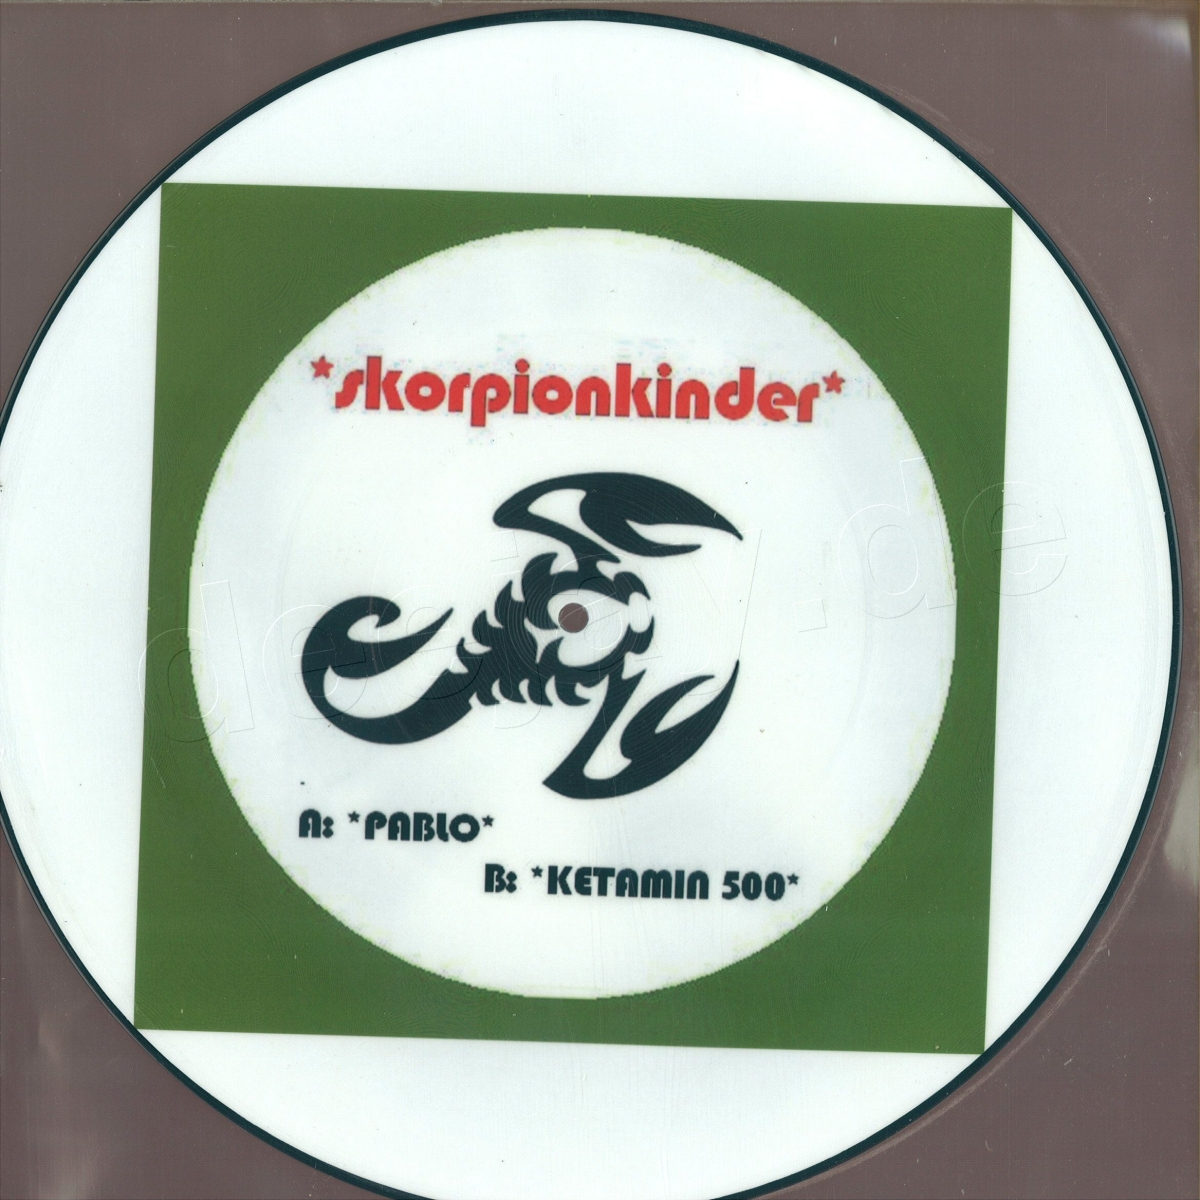 Skorpionkinder - Pablo / Ketamin 500